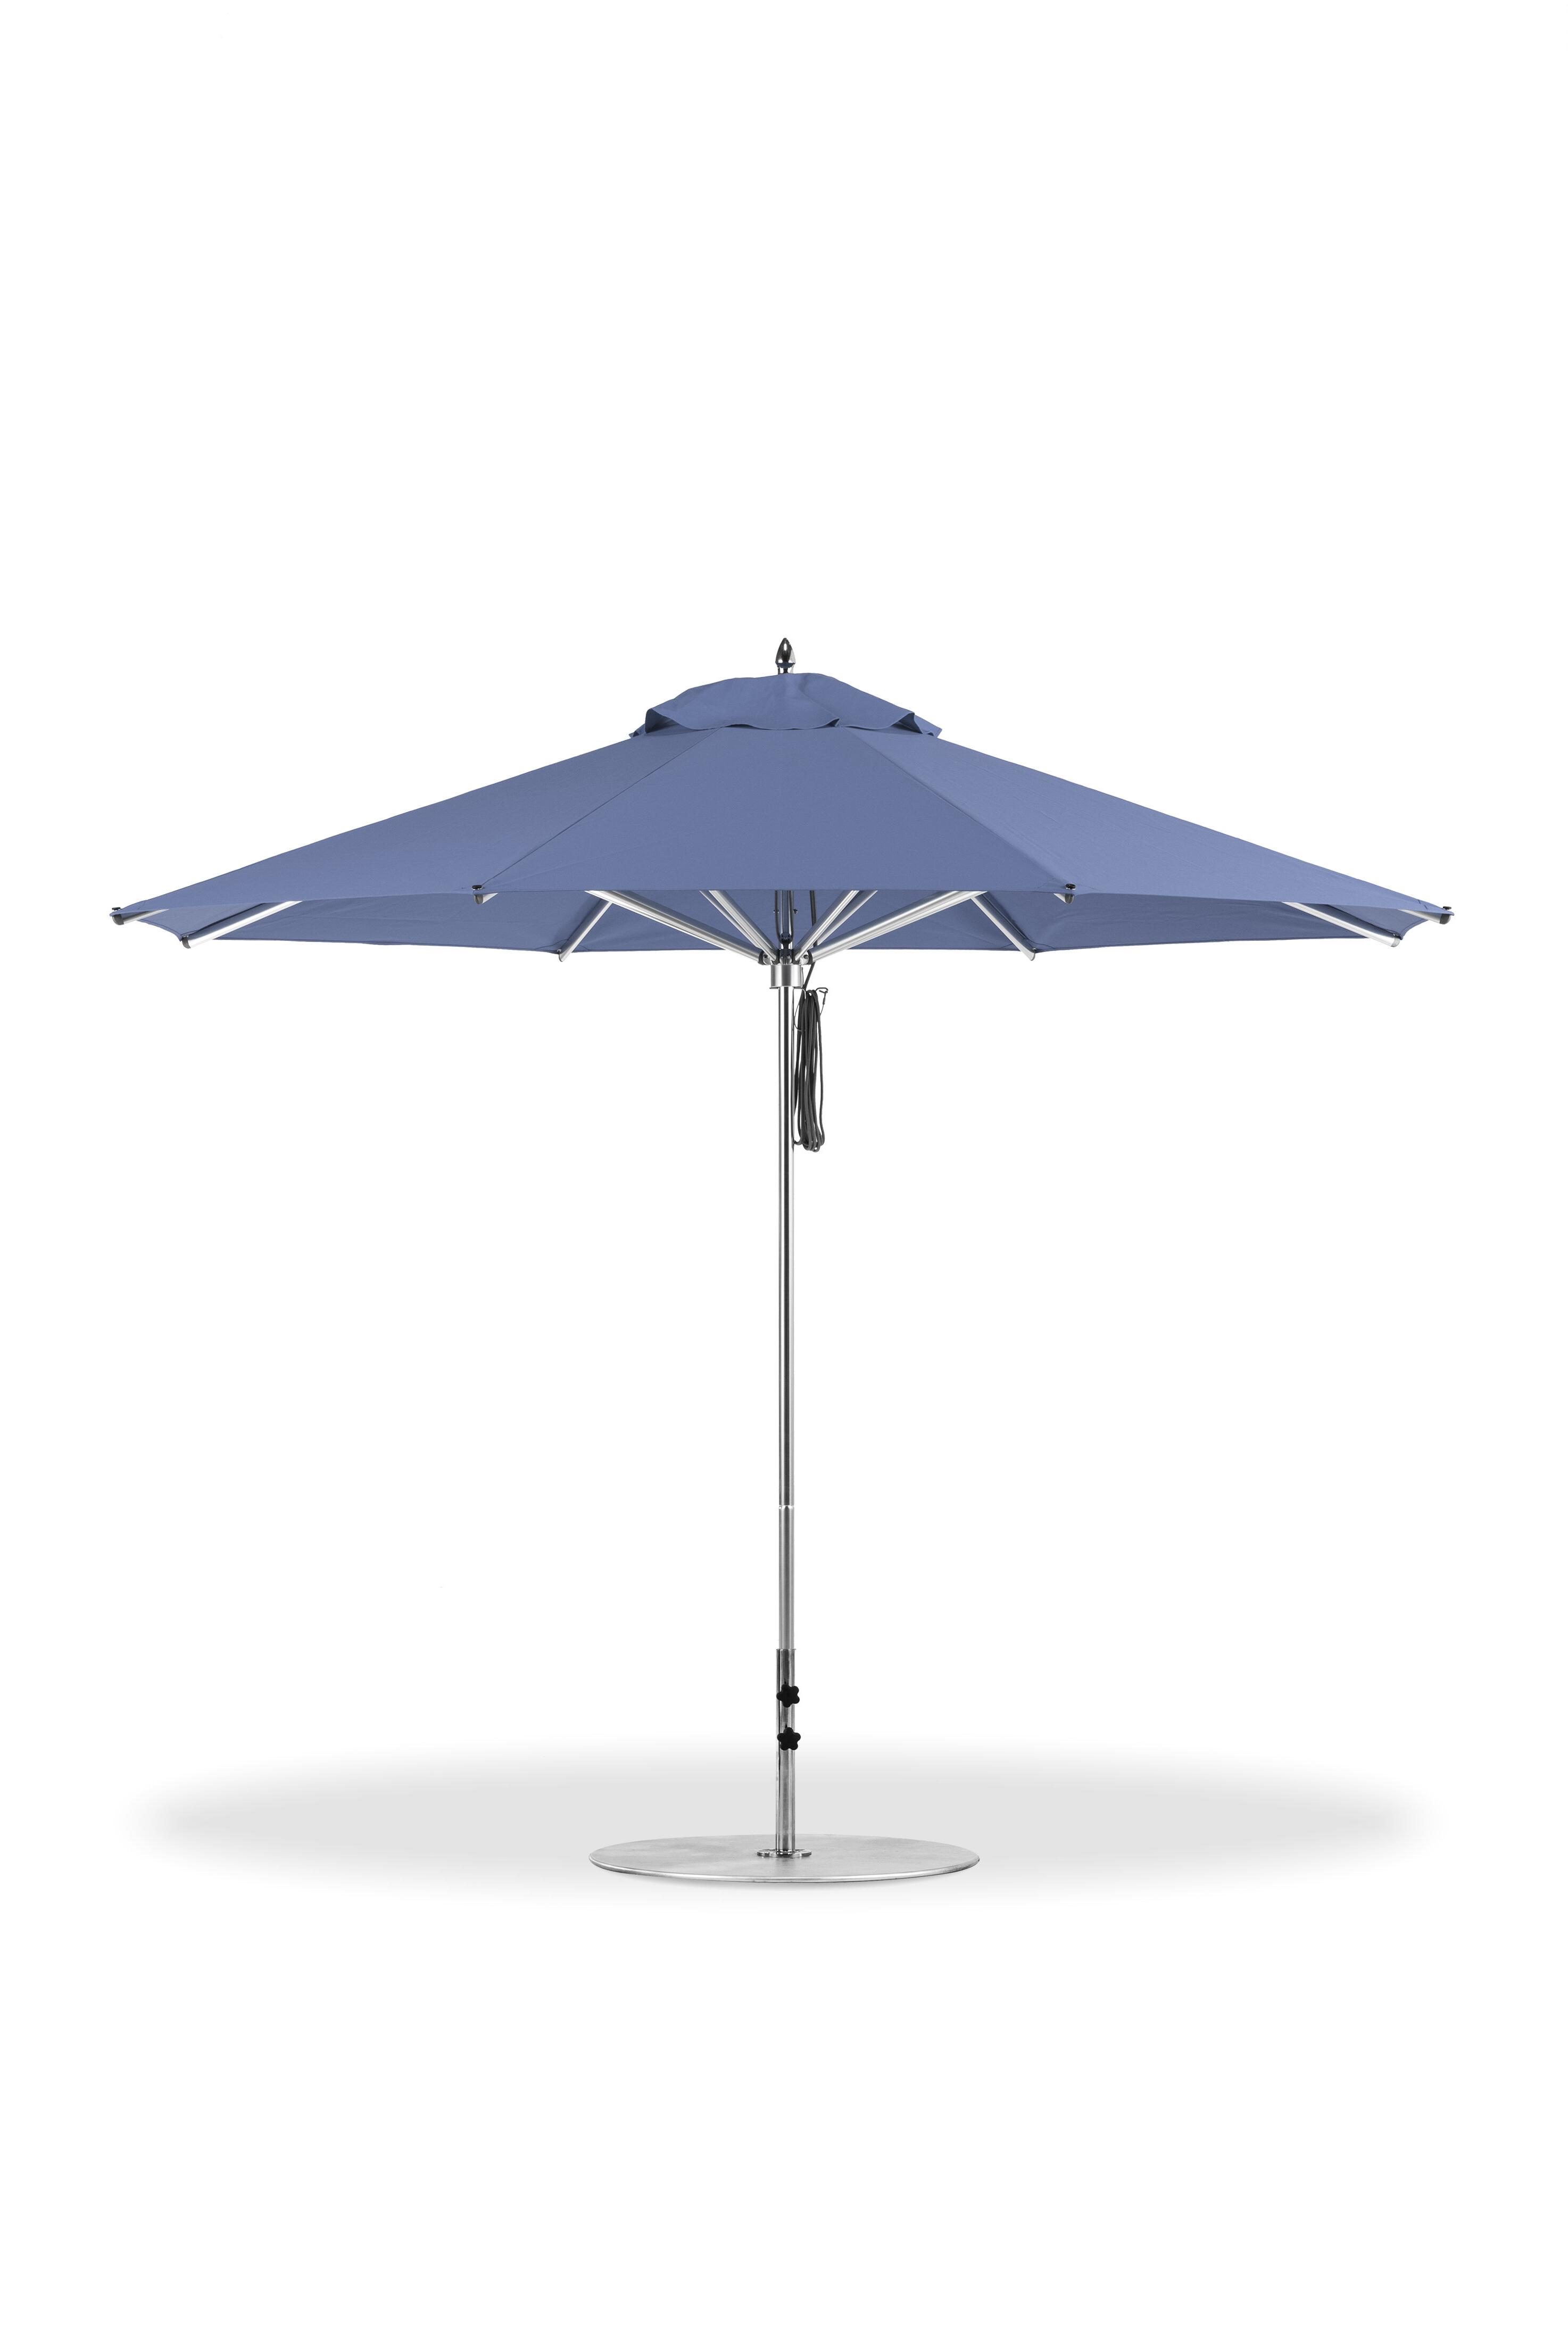 Current Maglione Fabric 4cantilever Umbrellas Inside Criddle 11' Market Umbrella (View 15 of 20)